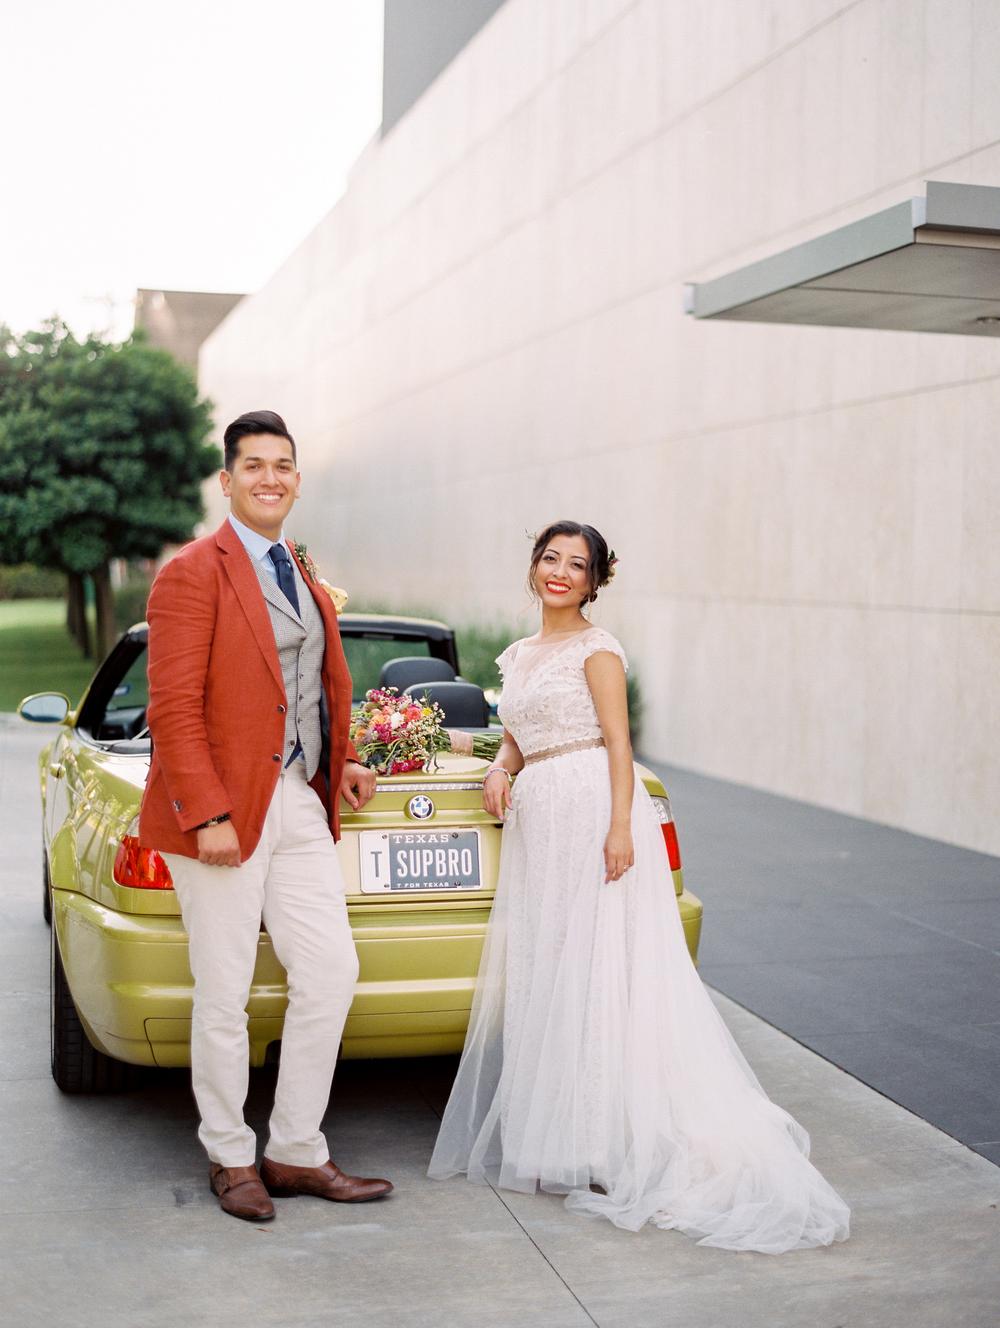 Dana-Fernandez-Photography-Martha-Stewart-Weddings-Houston-Texas-Wedding-Photographer-Film-22.jpg